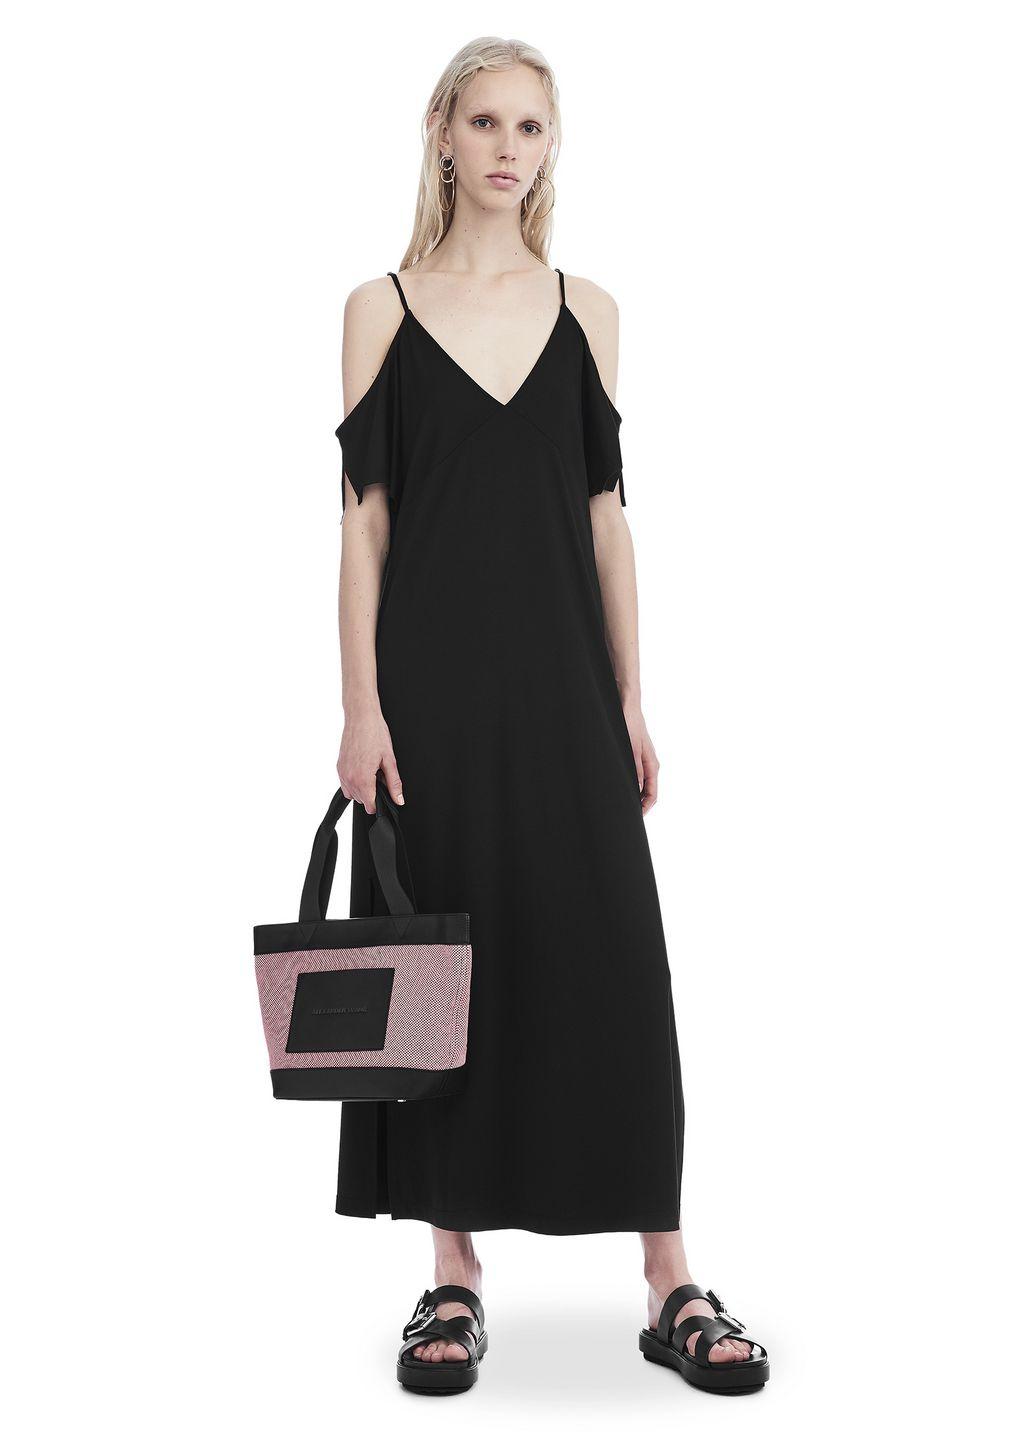 Dress Up 247 Login - Lux ponte cold shoulder midi dress long dress alexander wang official site